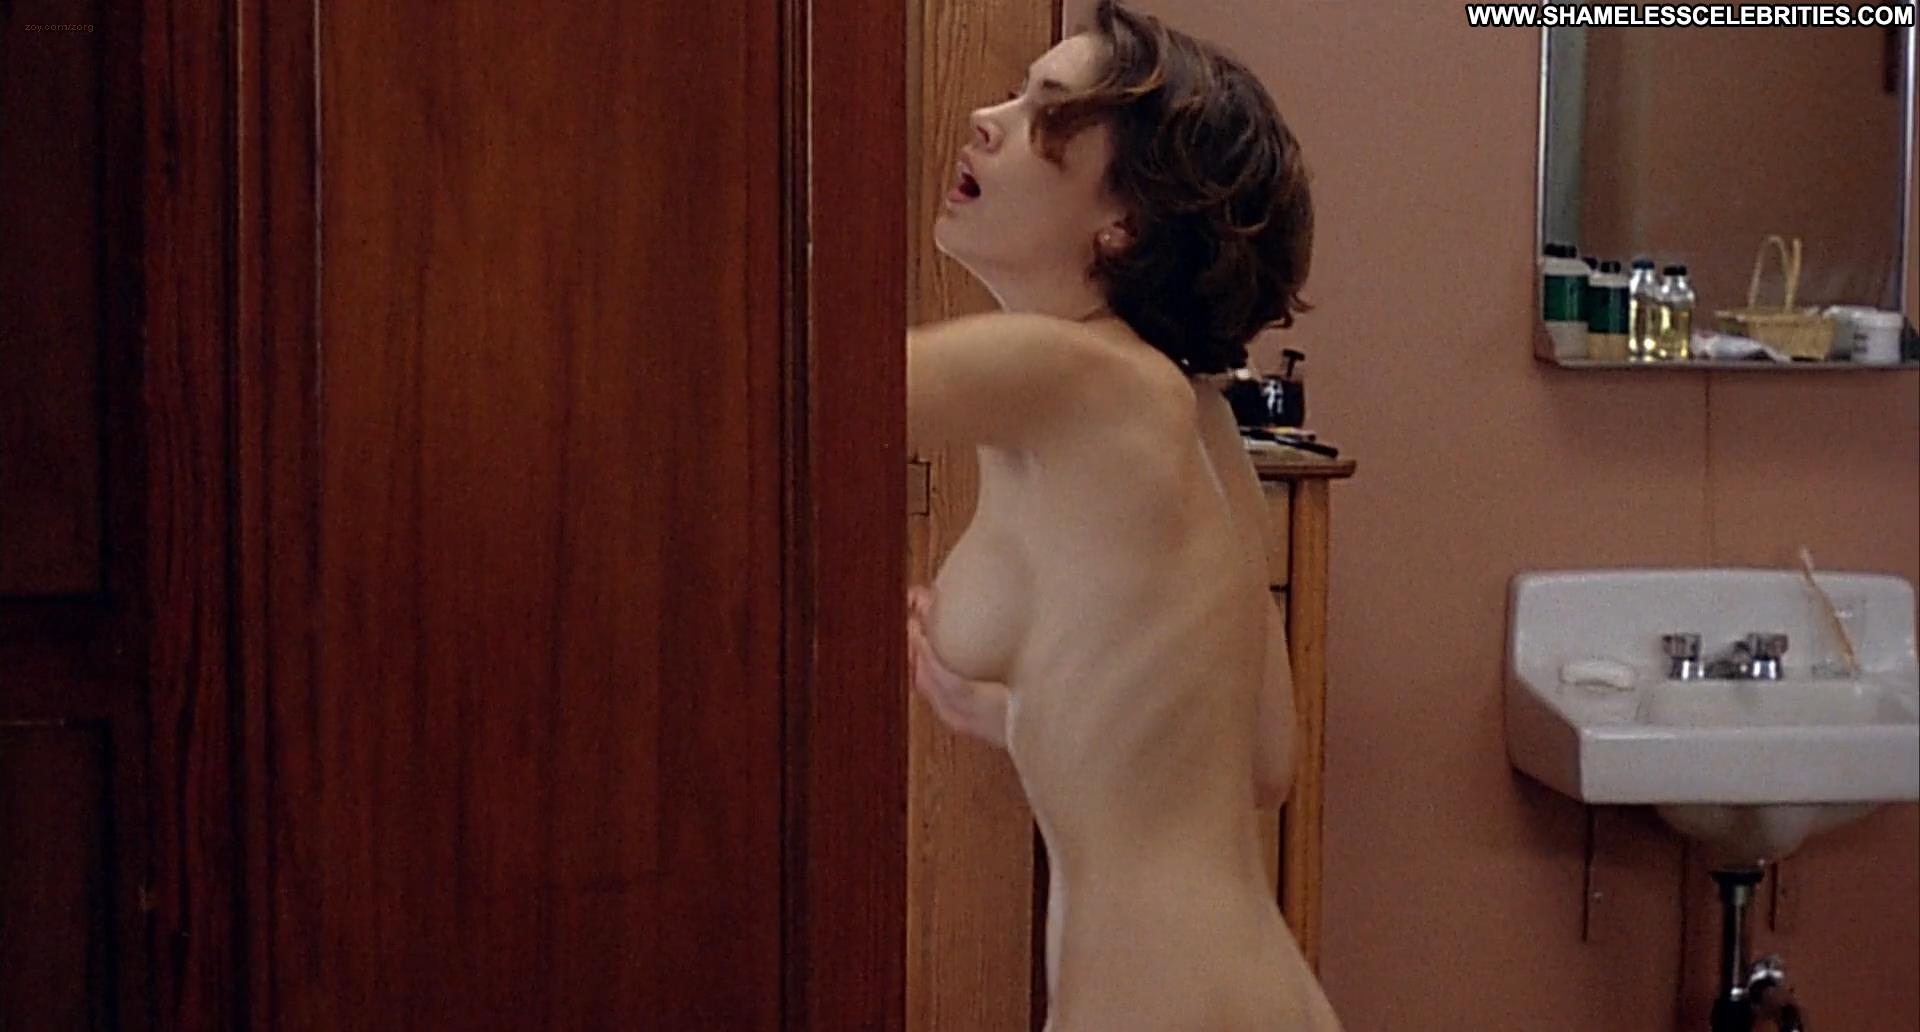 Bikini Stefania Ferrario nude (58 photo), Pussy, Hot, Twitter, swimsuit 2020